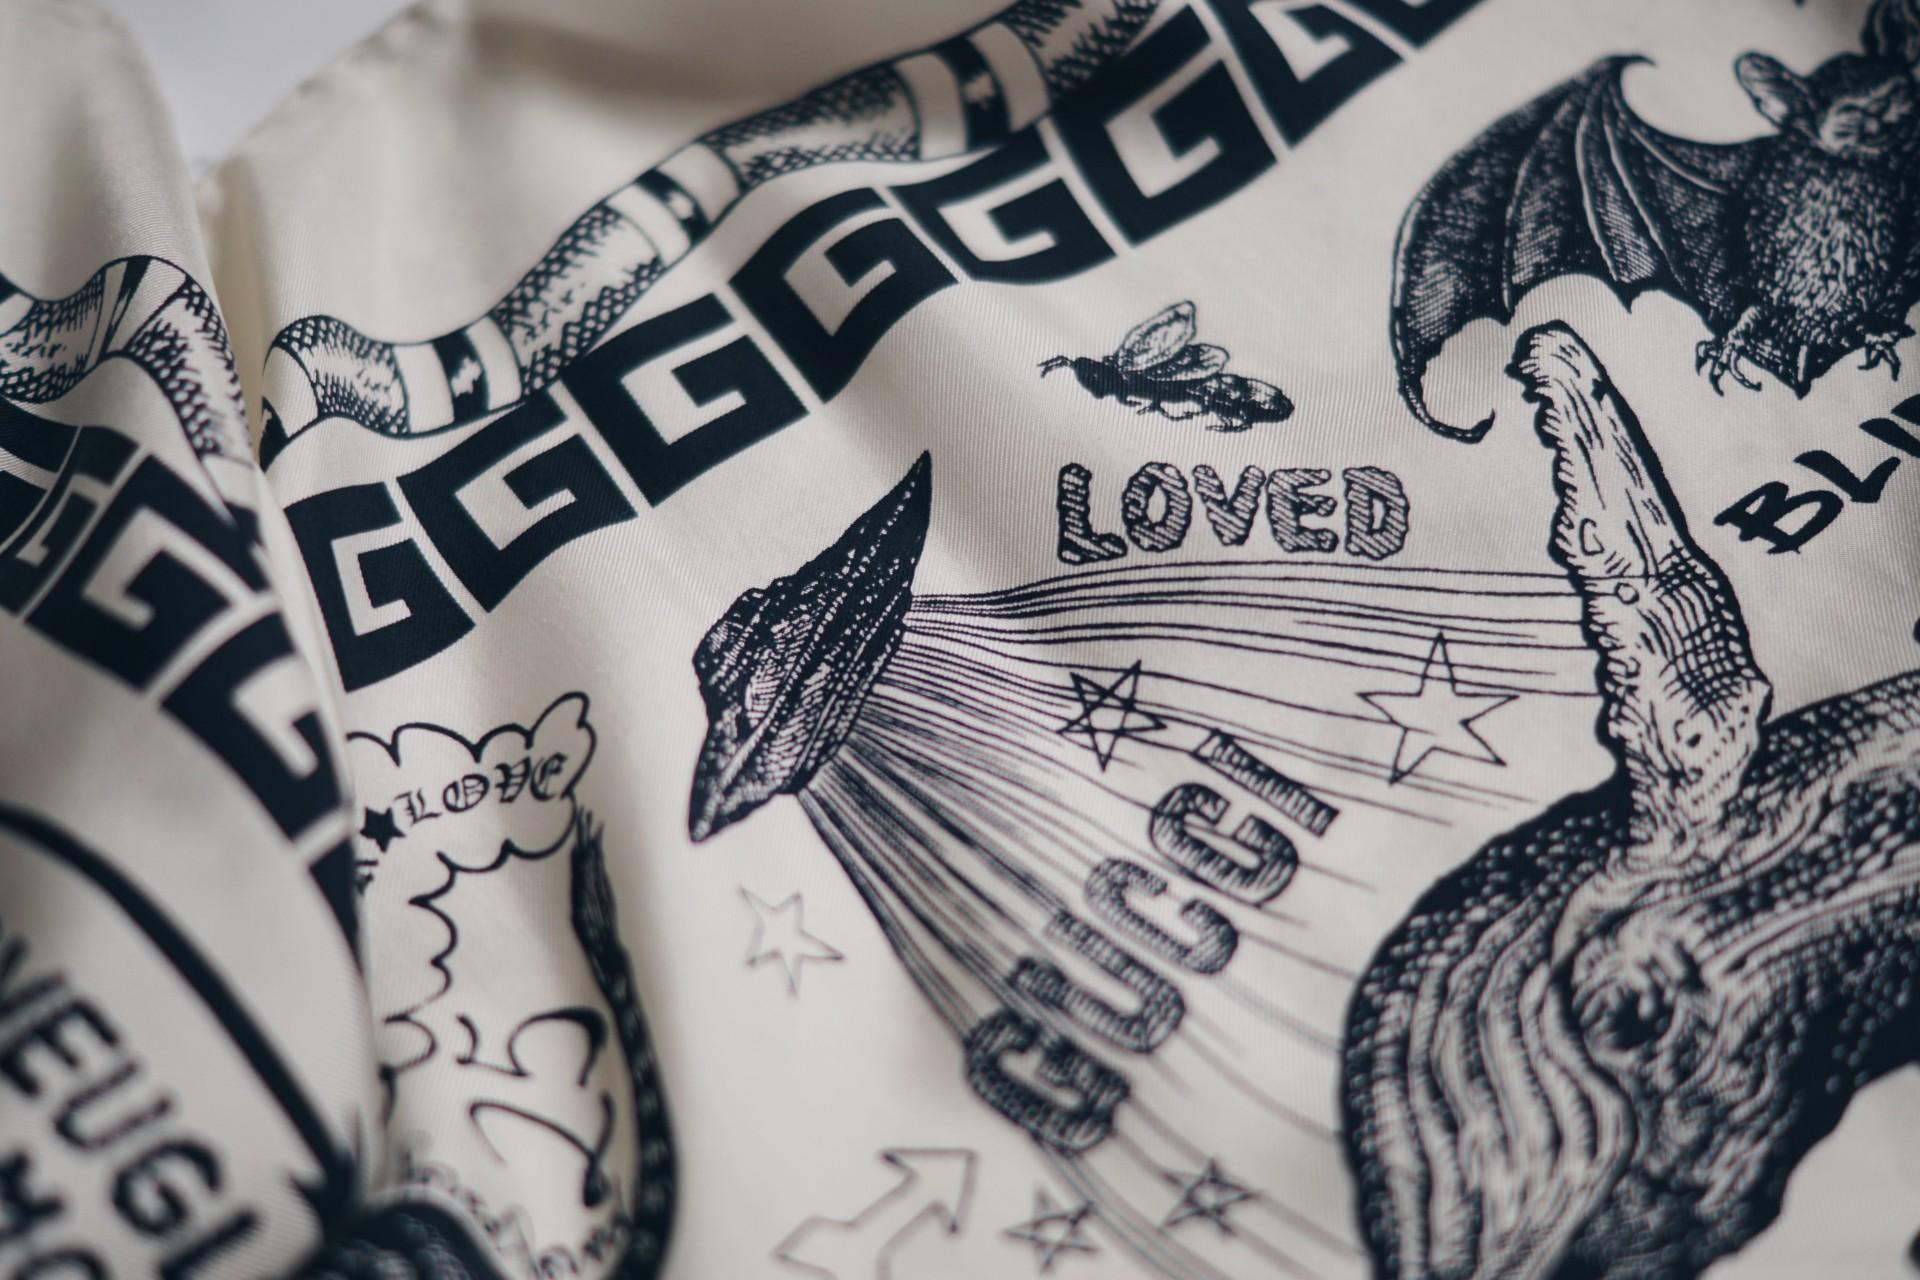 gucci_dbkstylez_blind_for_love_silk_scarf_spring_collection18